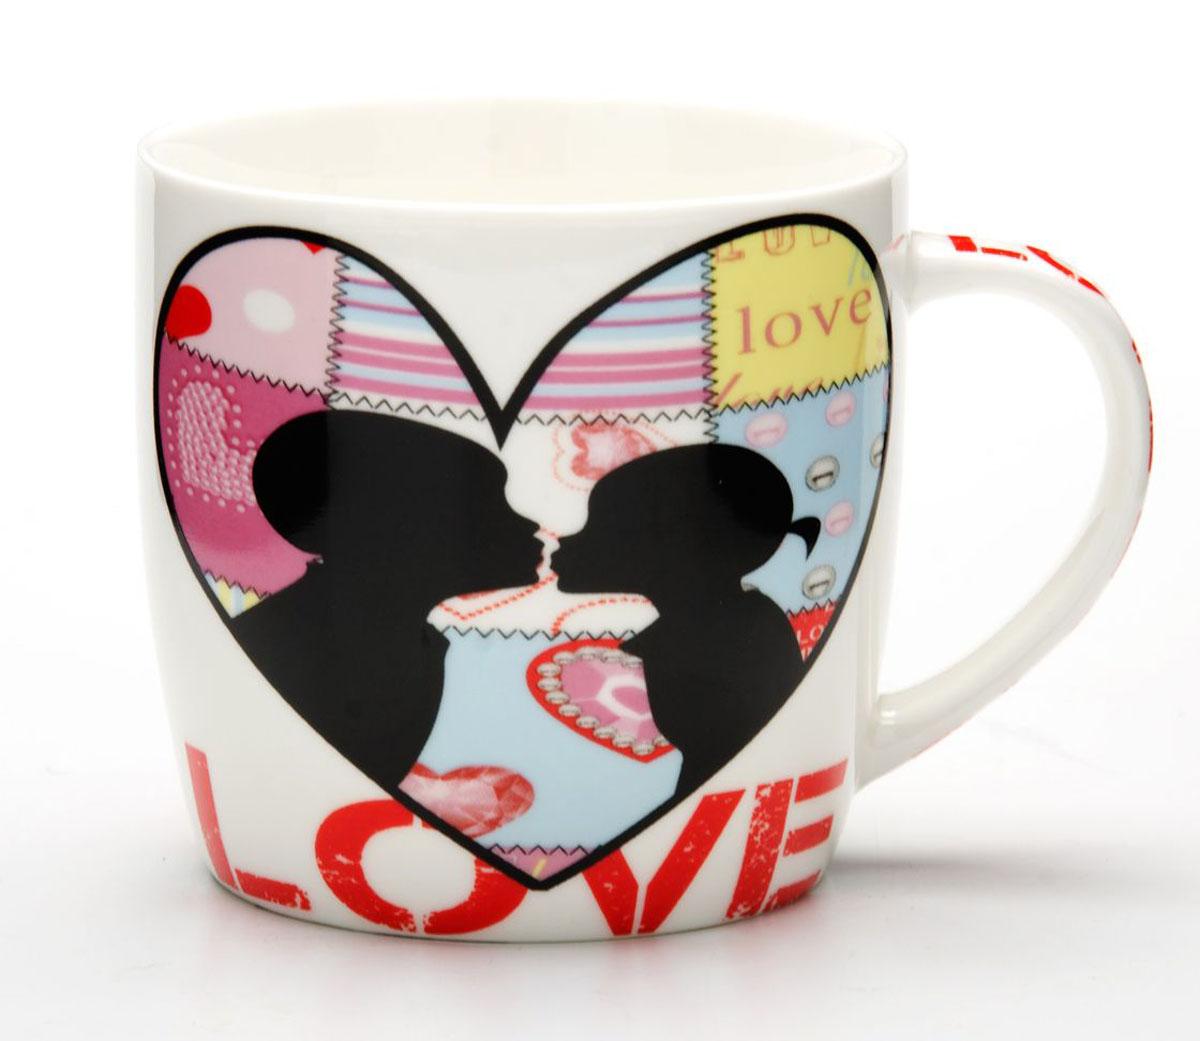 Кружка Loraine I Love You, 340 мл. 24468 носки 3 пары infinity kids для девочки цвет мультиколор